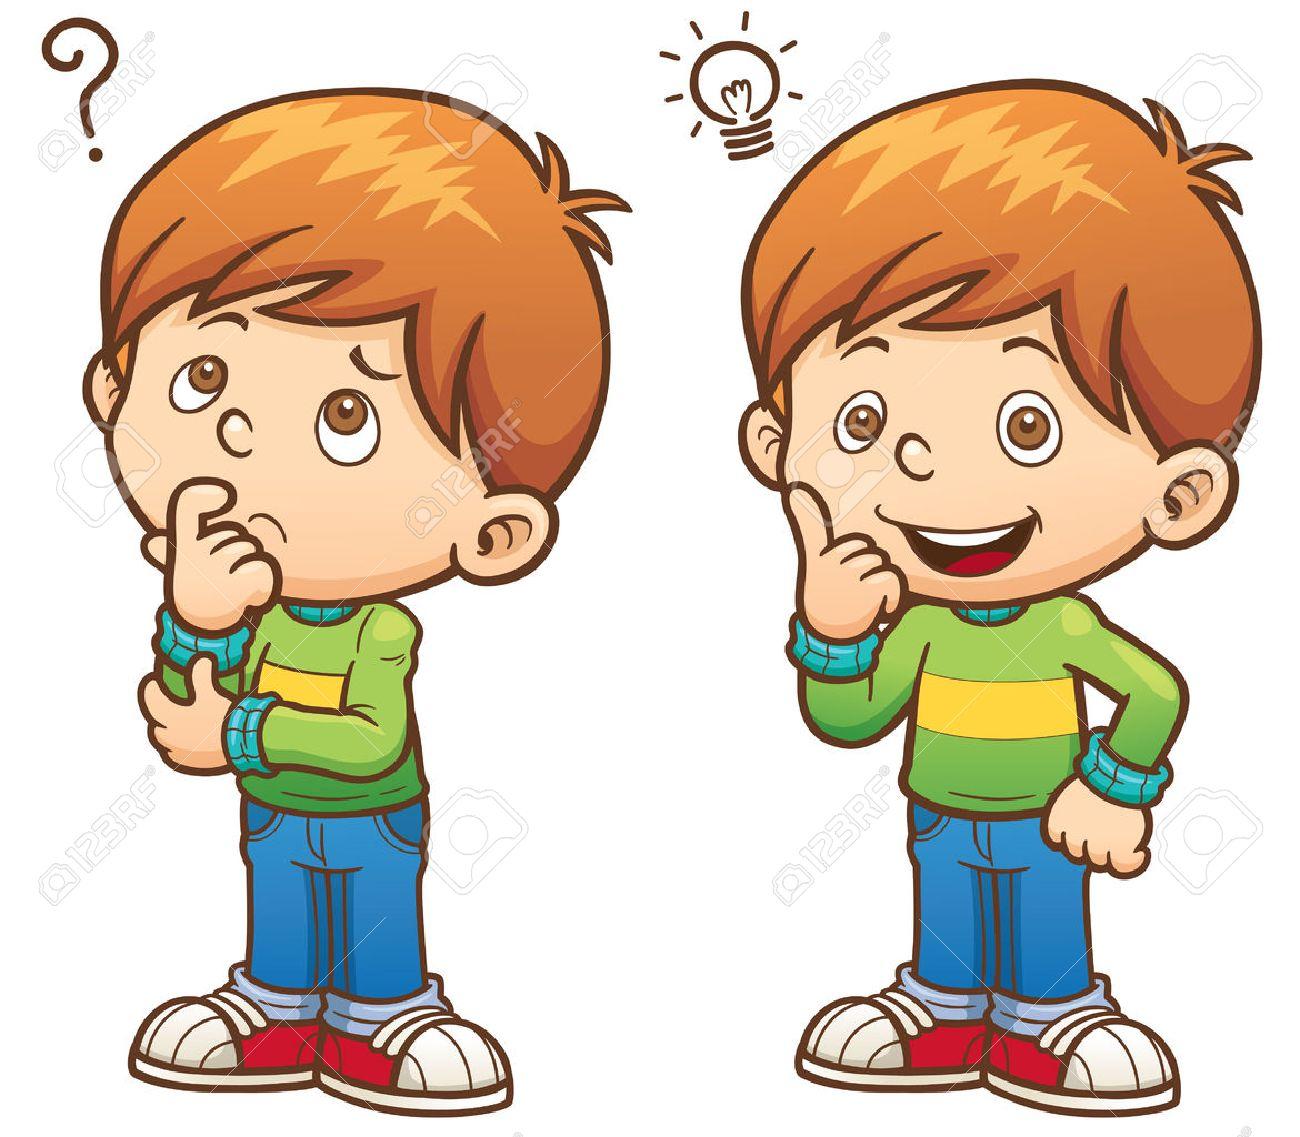 illustration of Cartoon Boy thinking - 52125759